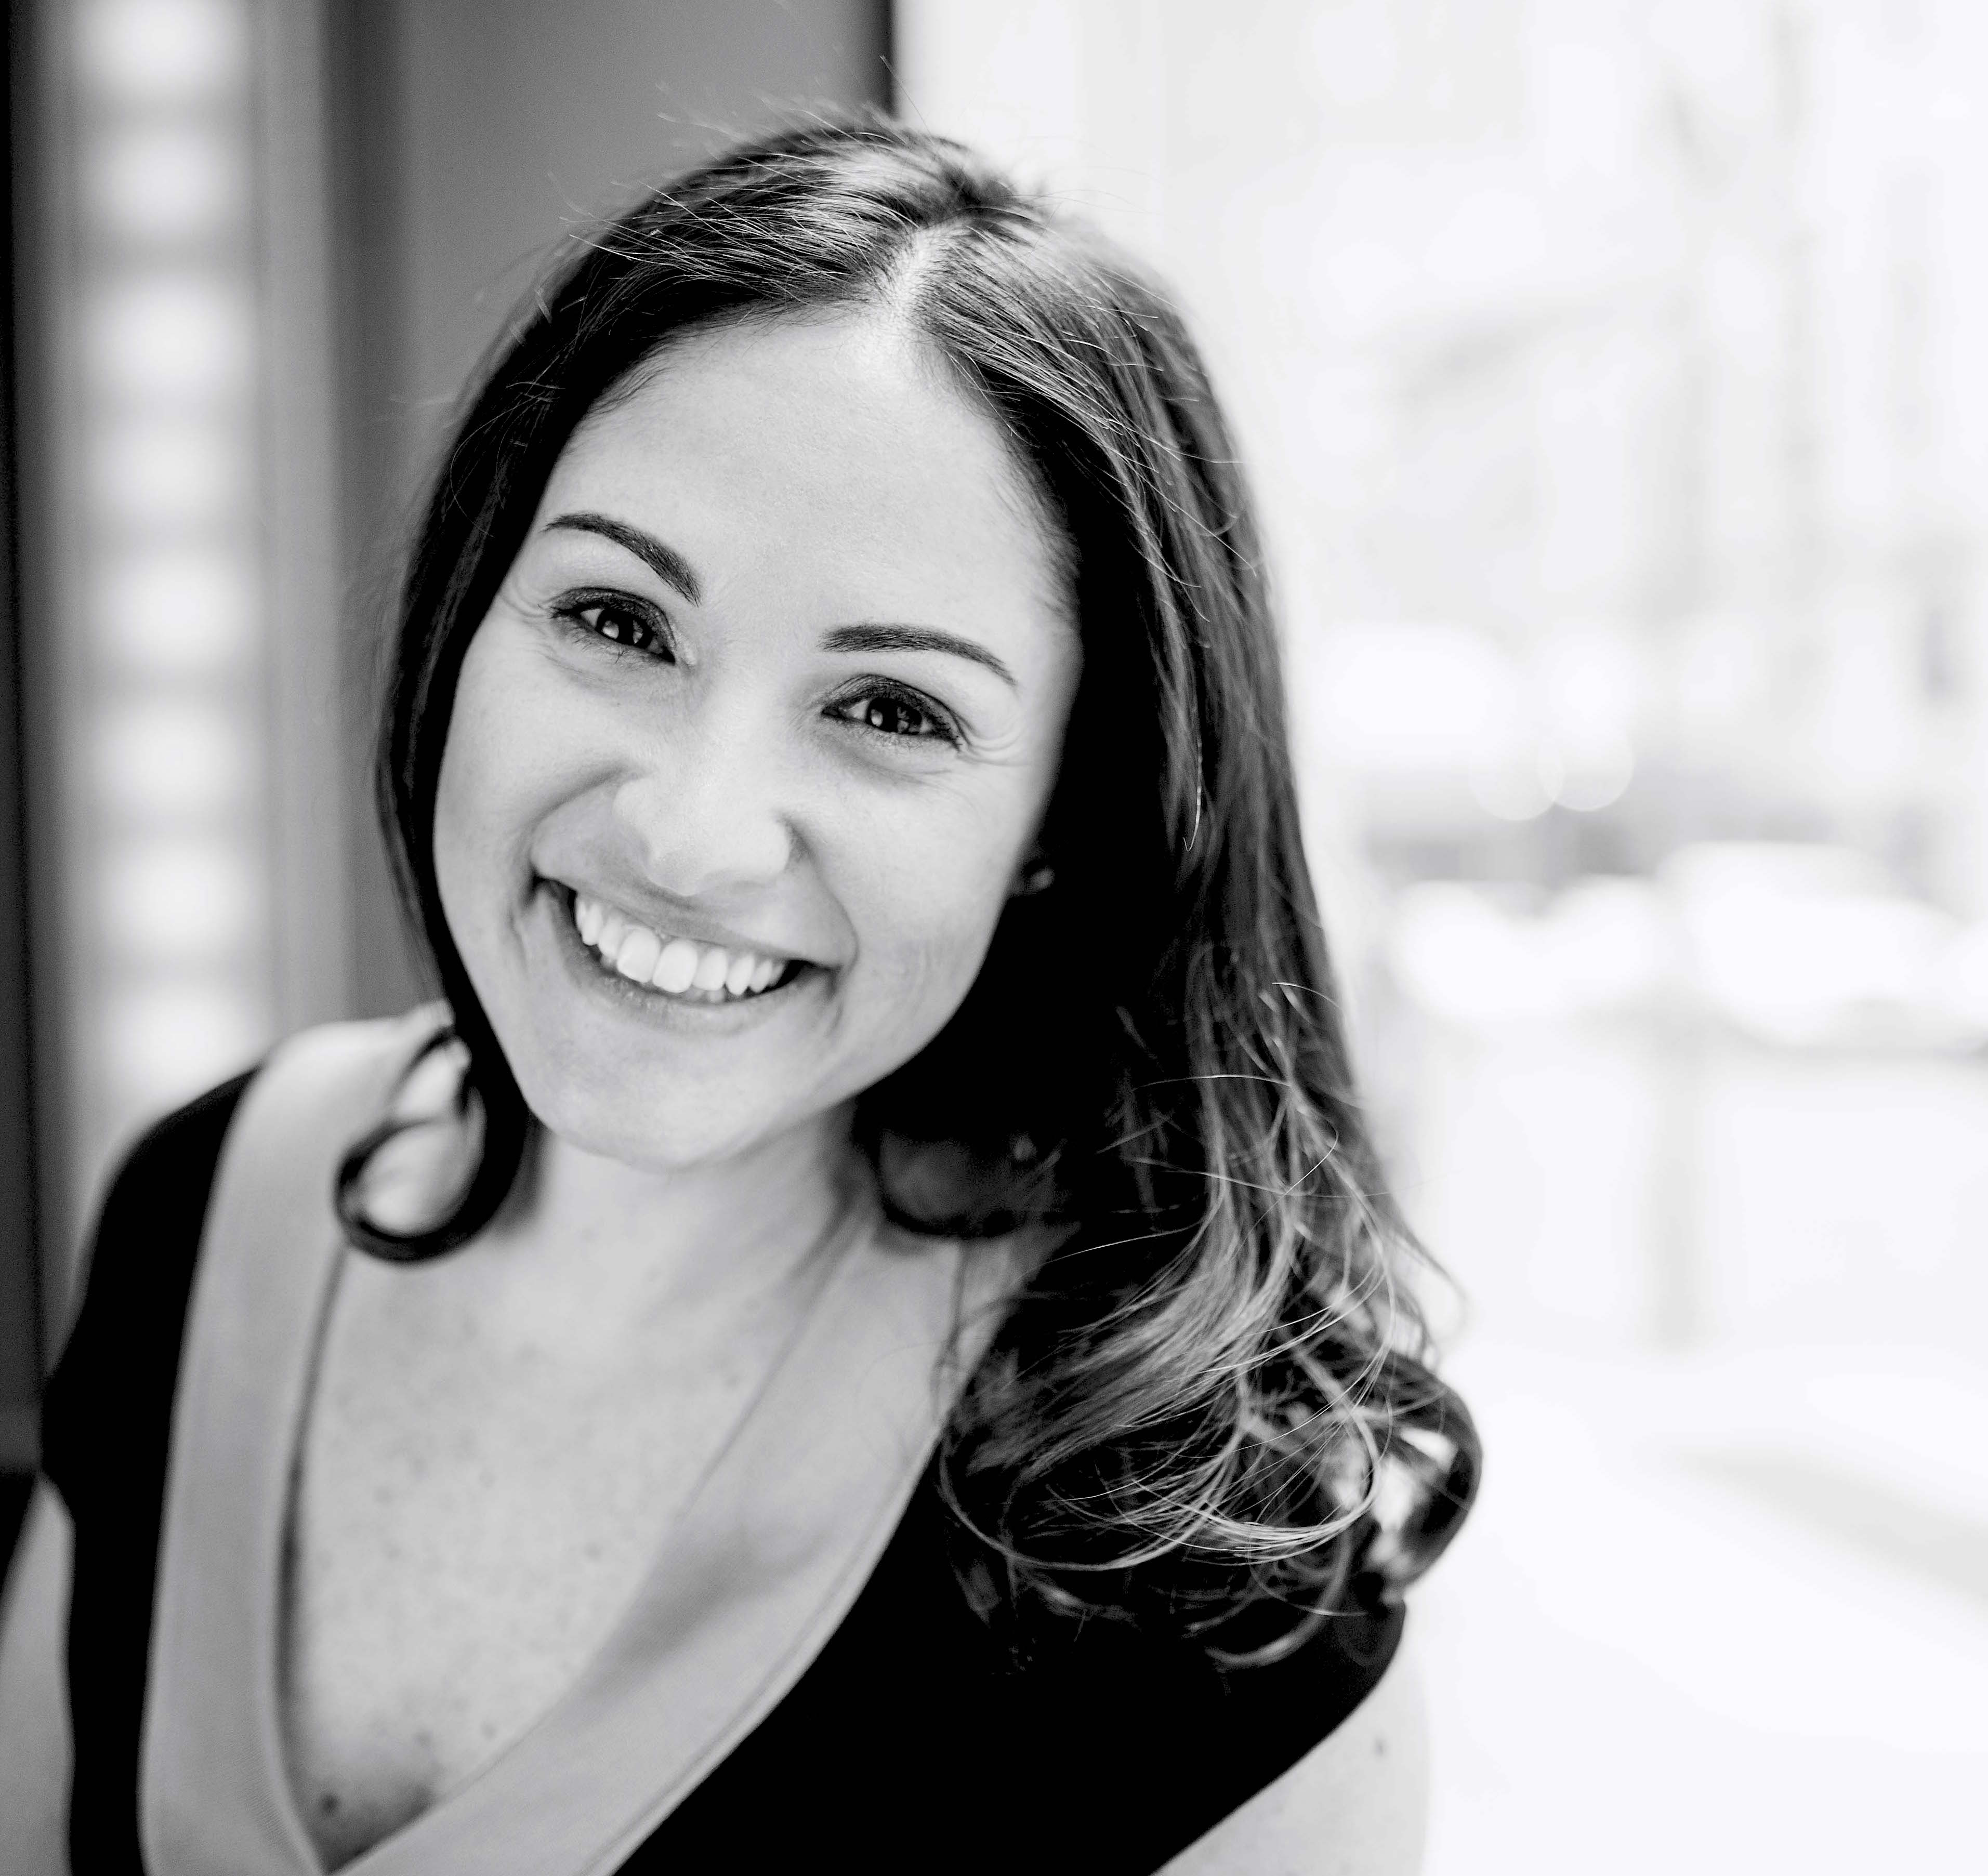 Pamela Riely